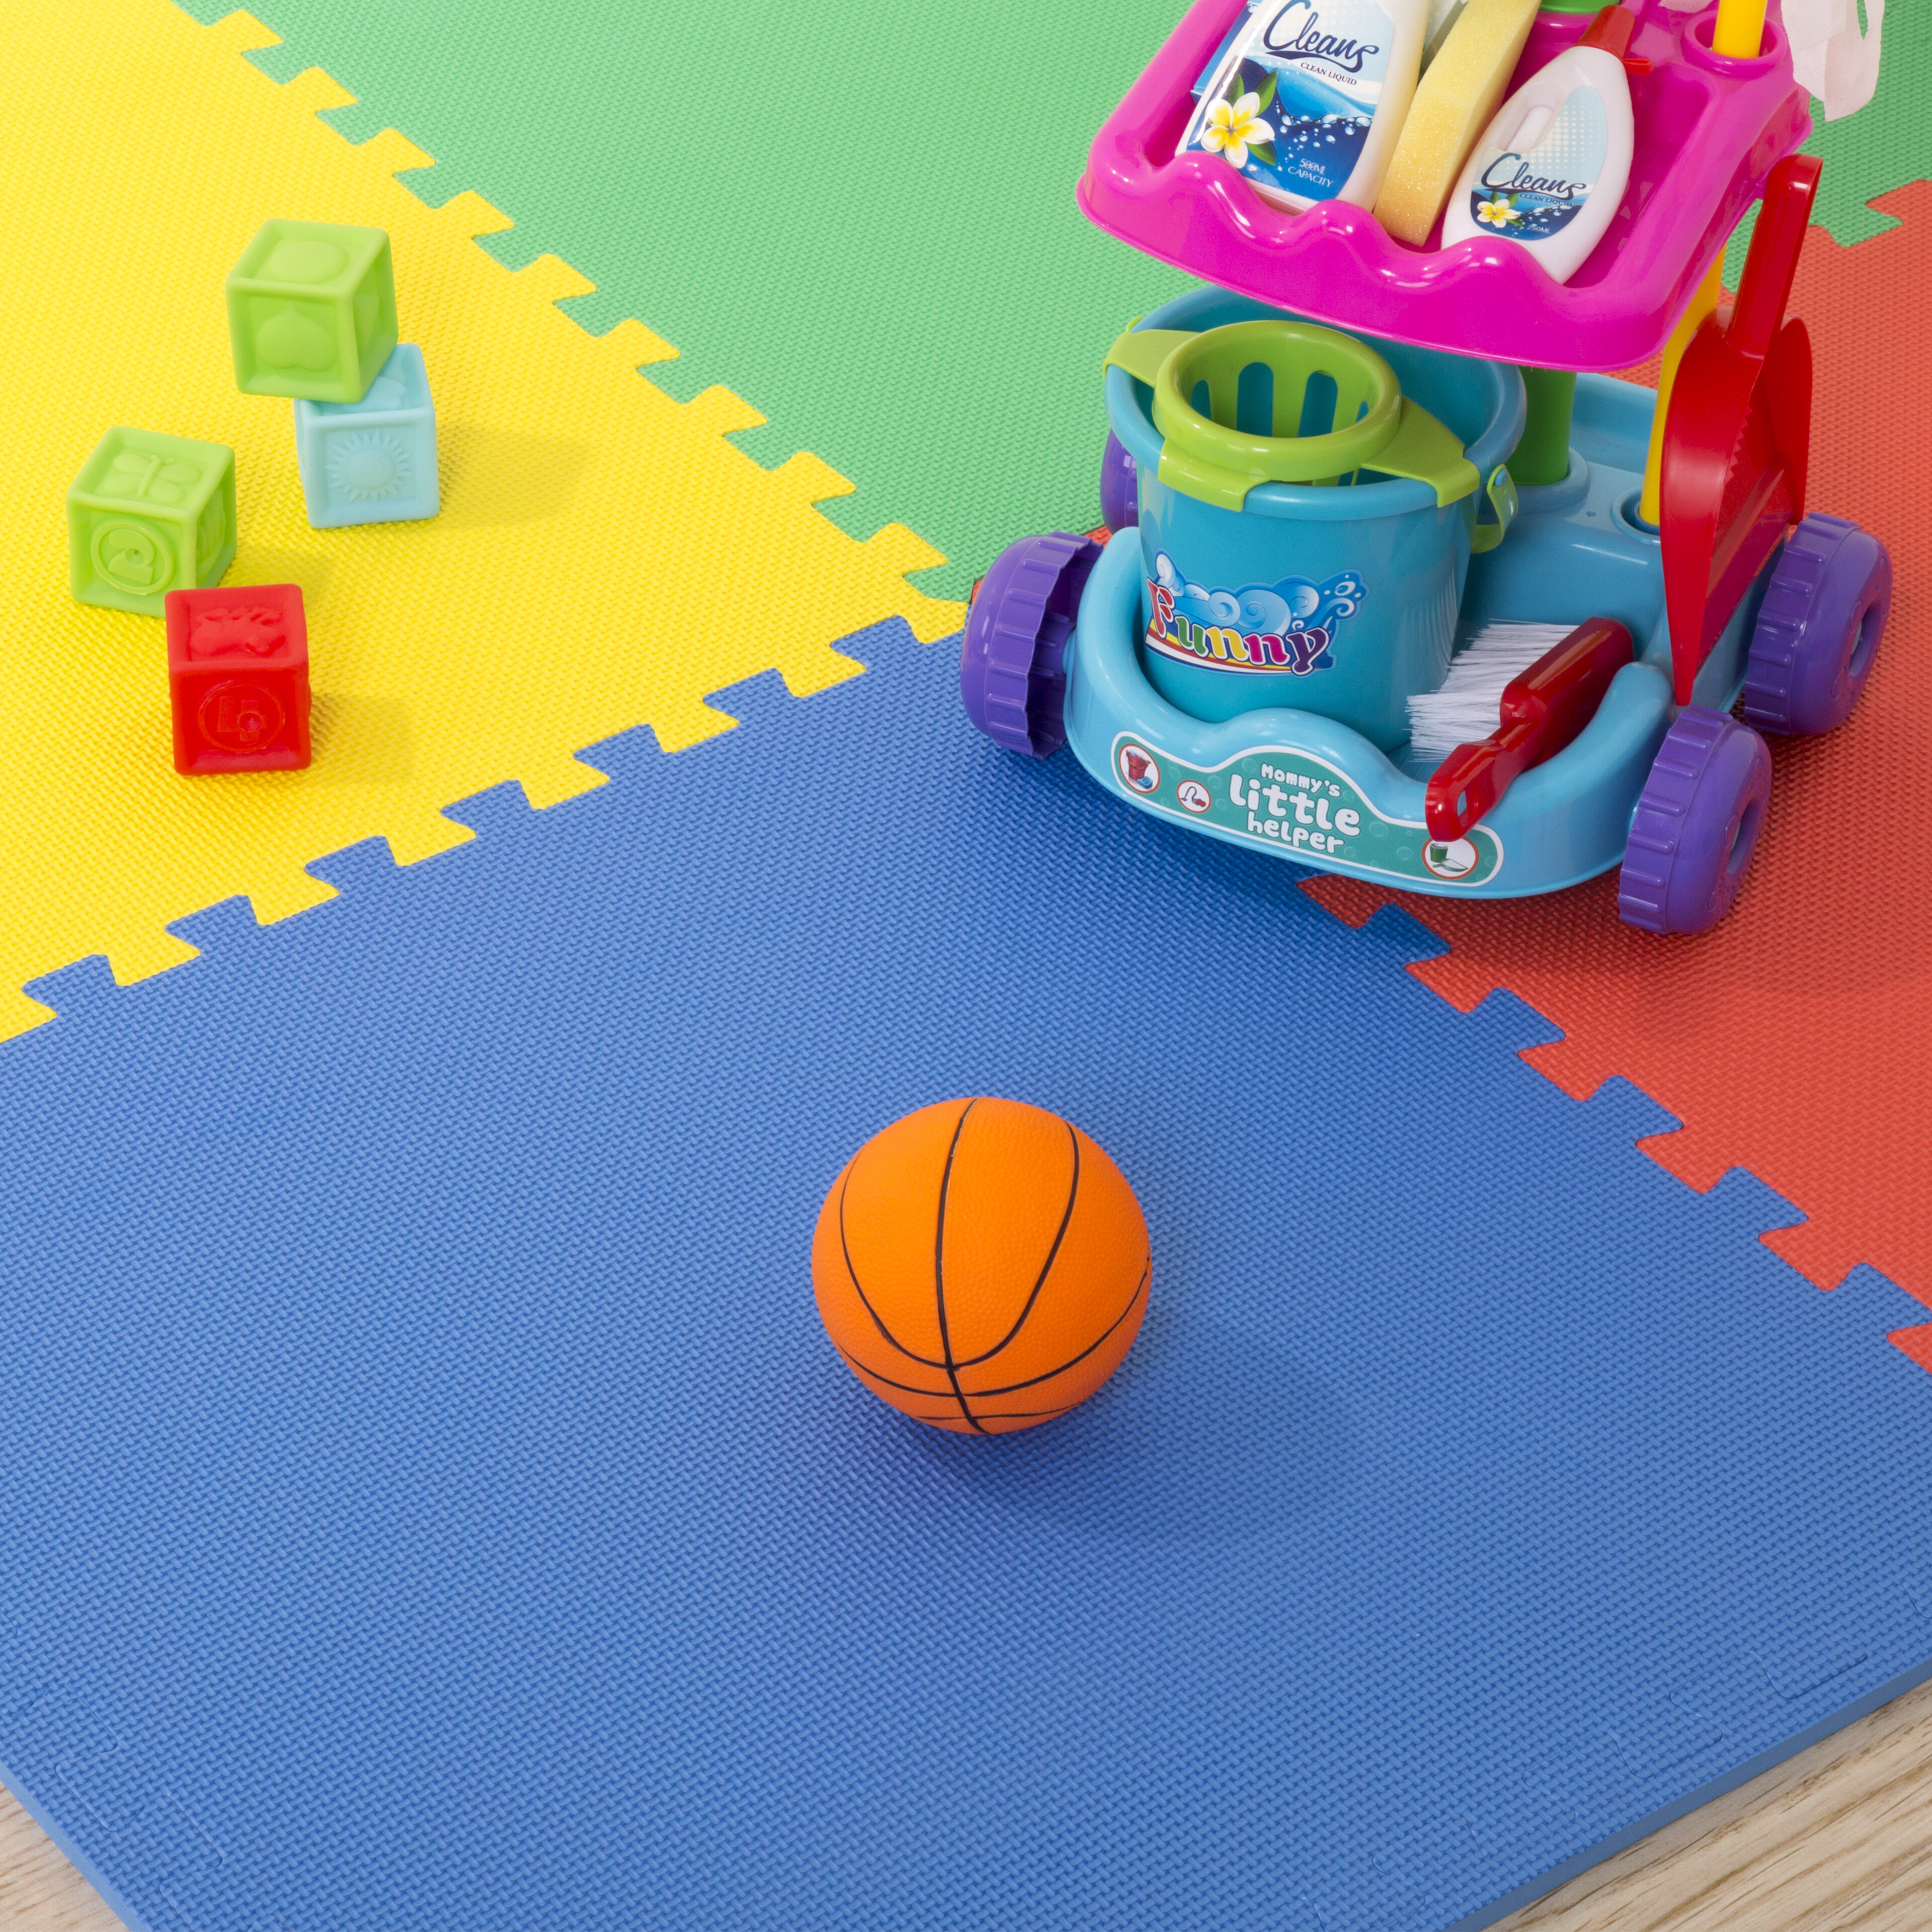 interlocking square mat foam sports workout grain waterproof homcom soft exercise kid outdoors feet mats floor play wood